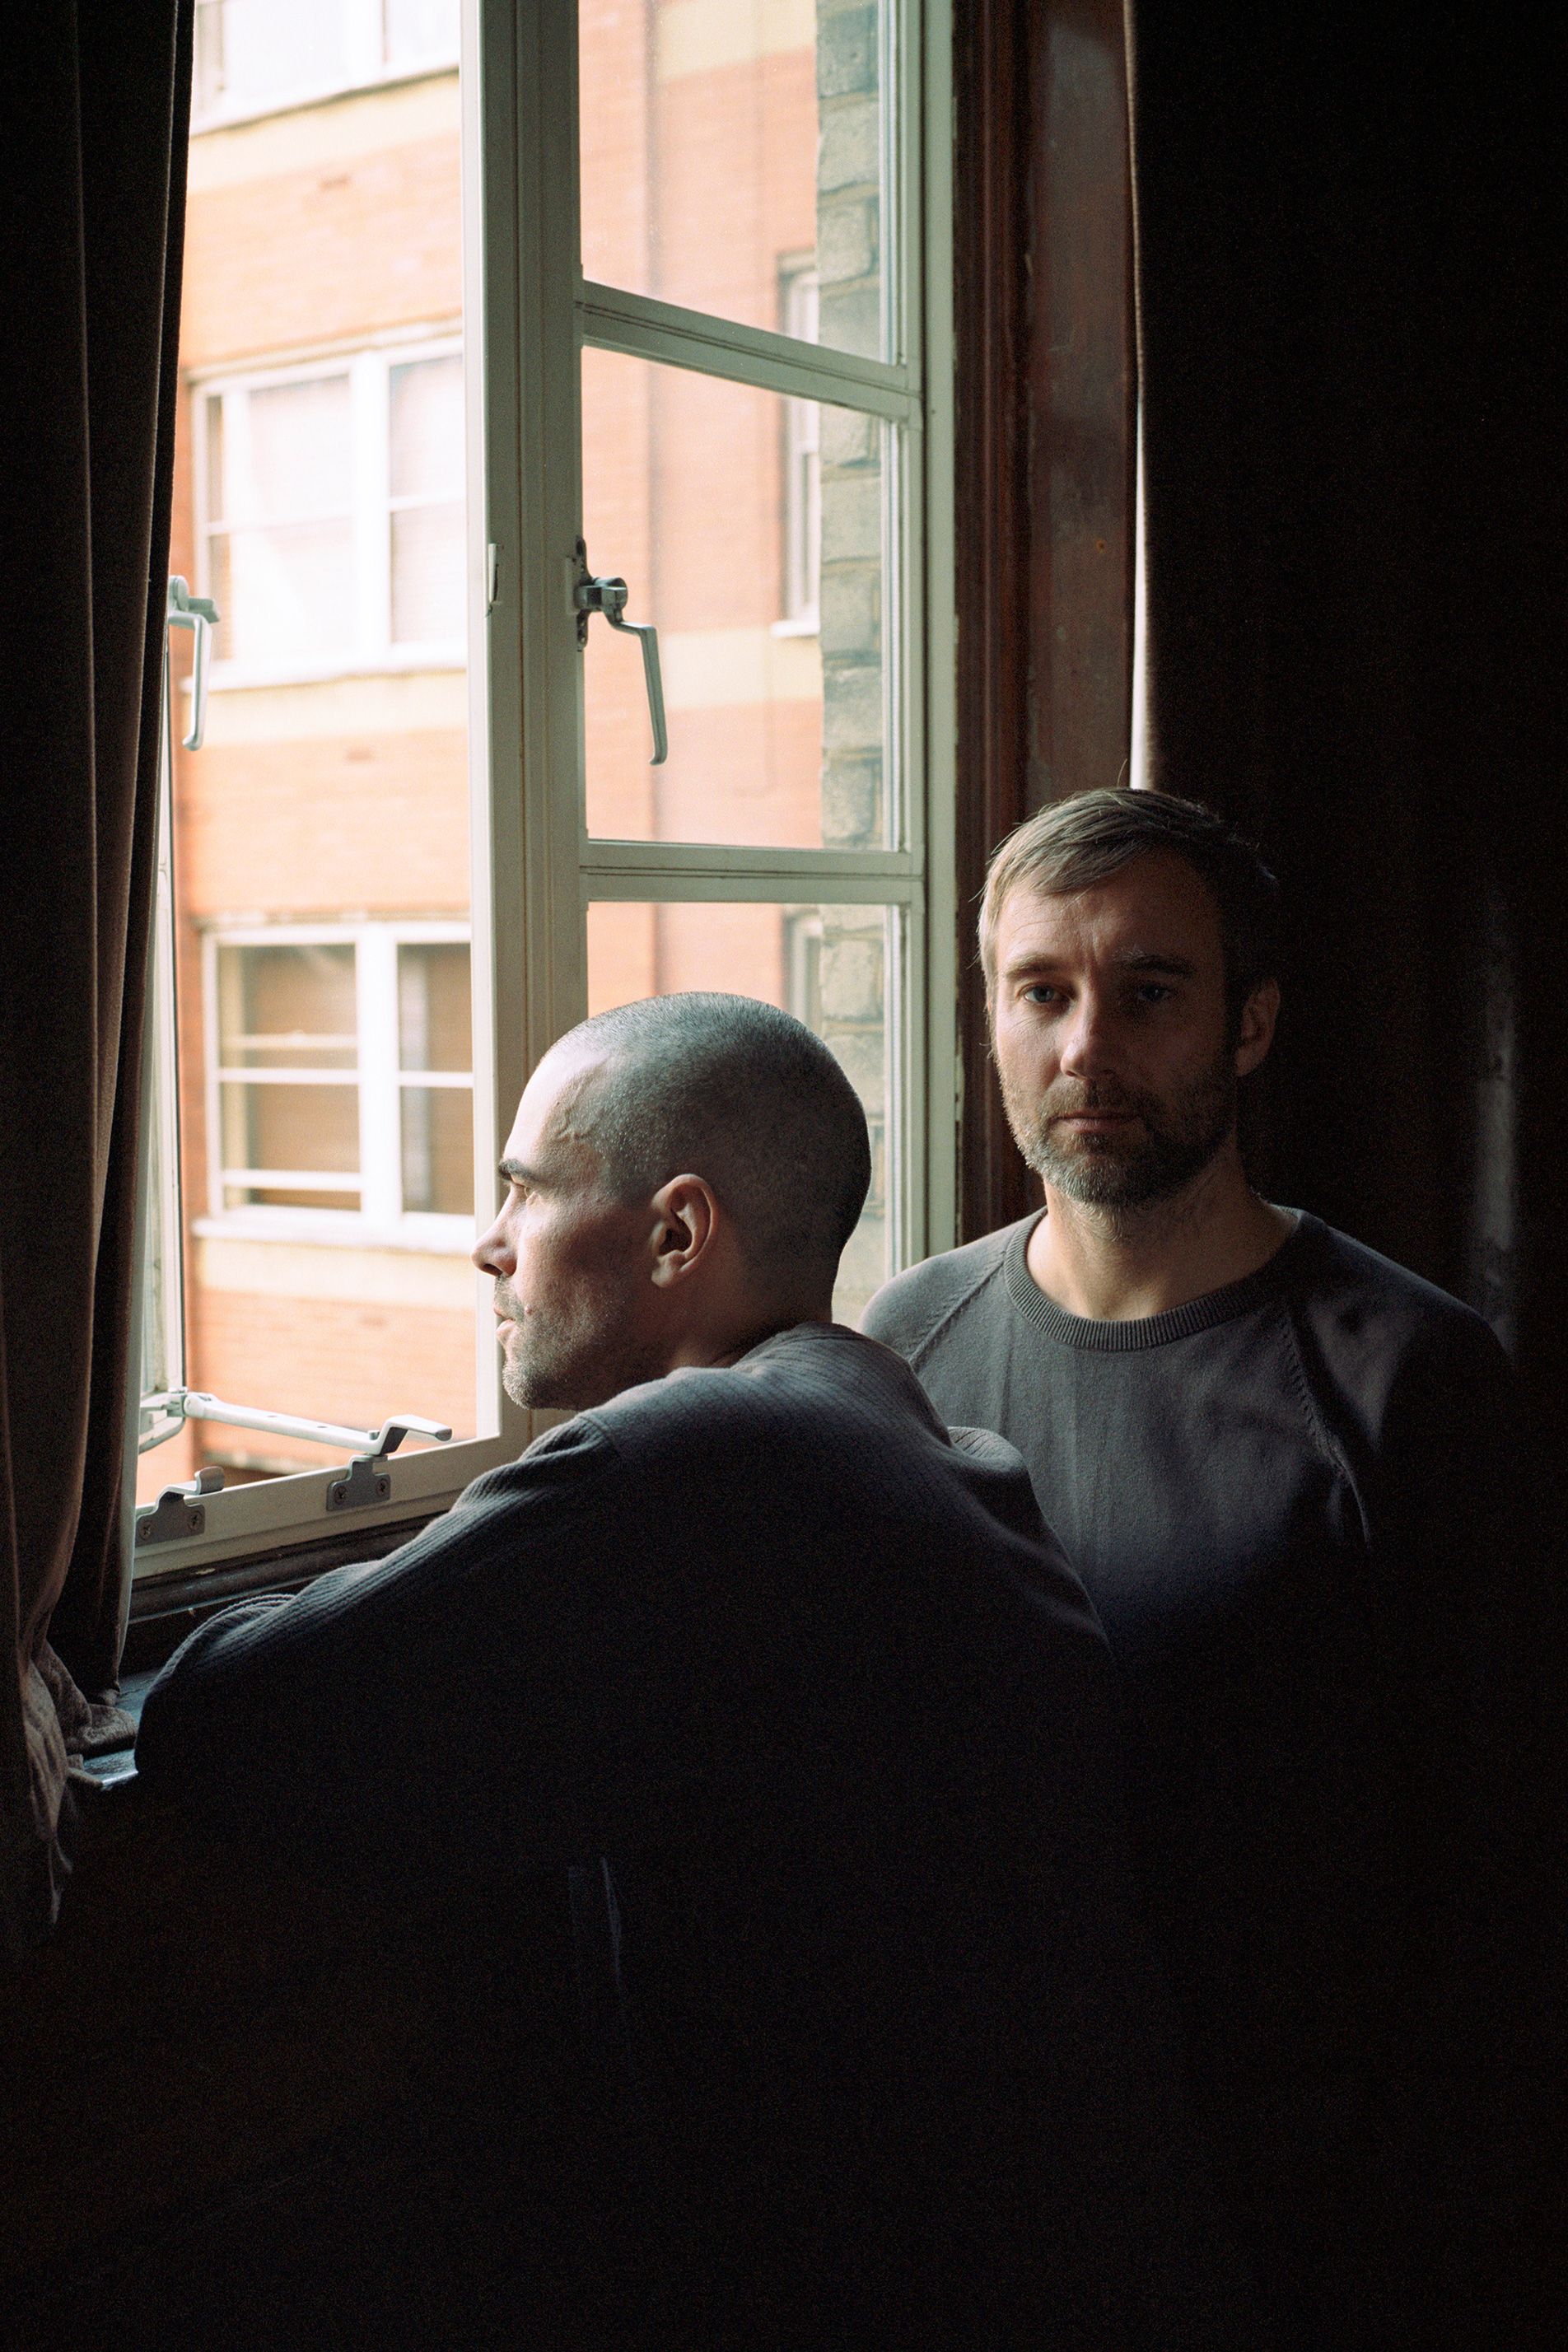 autechre-elseq-window.jpg